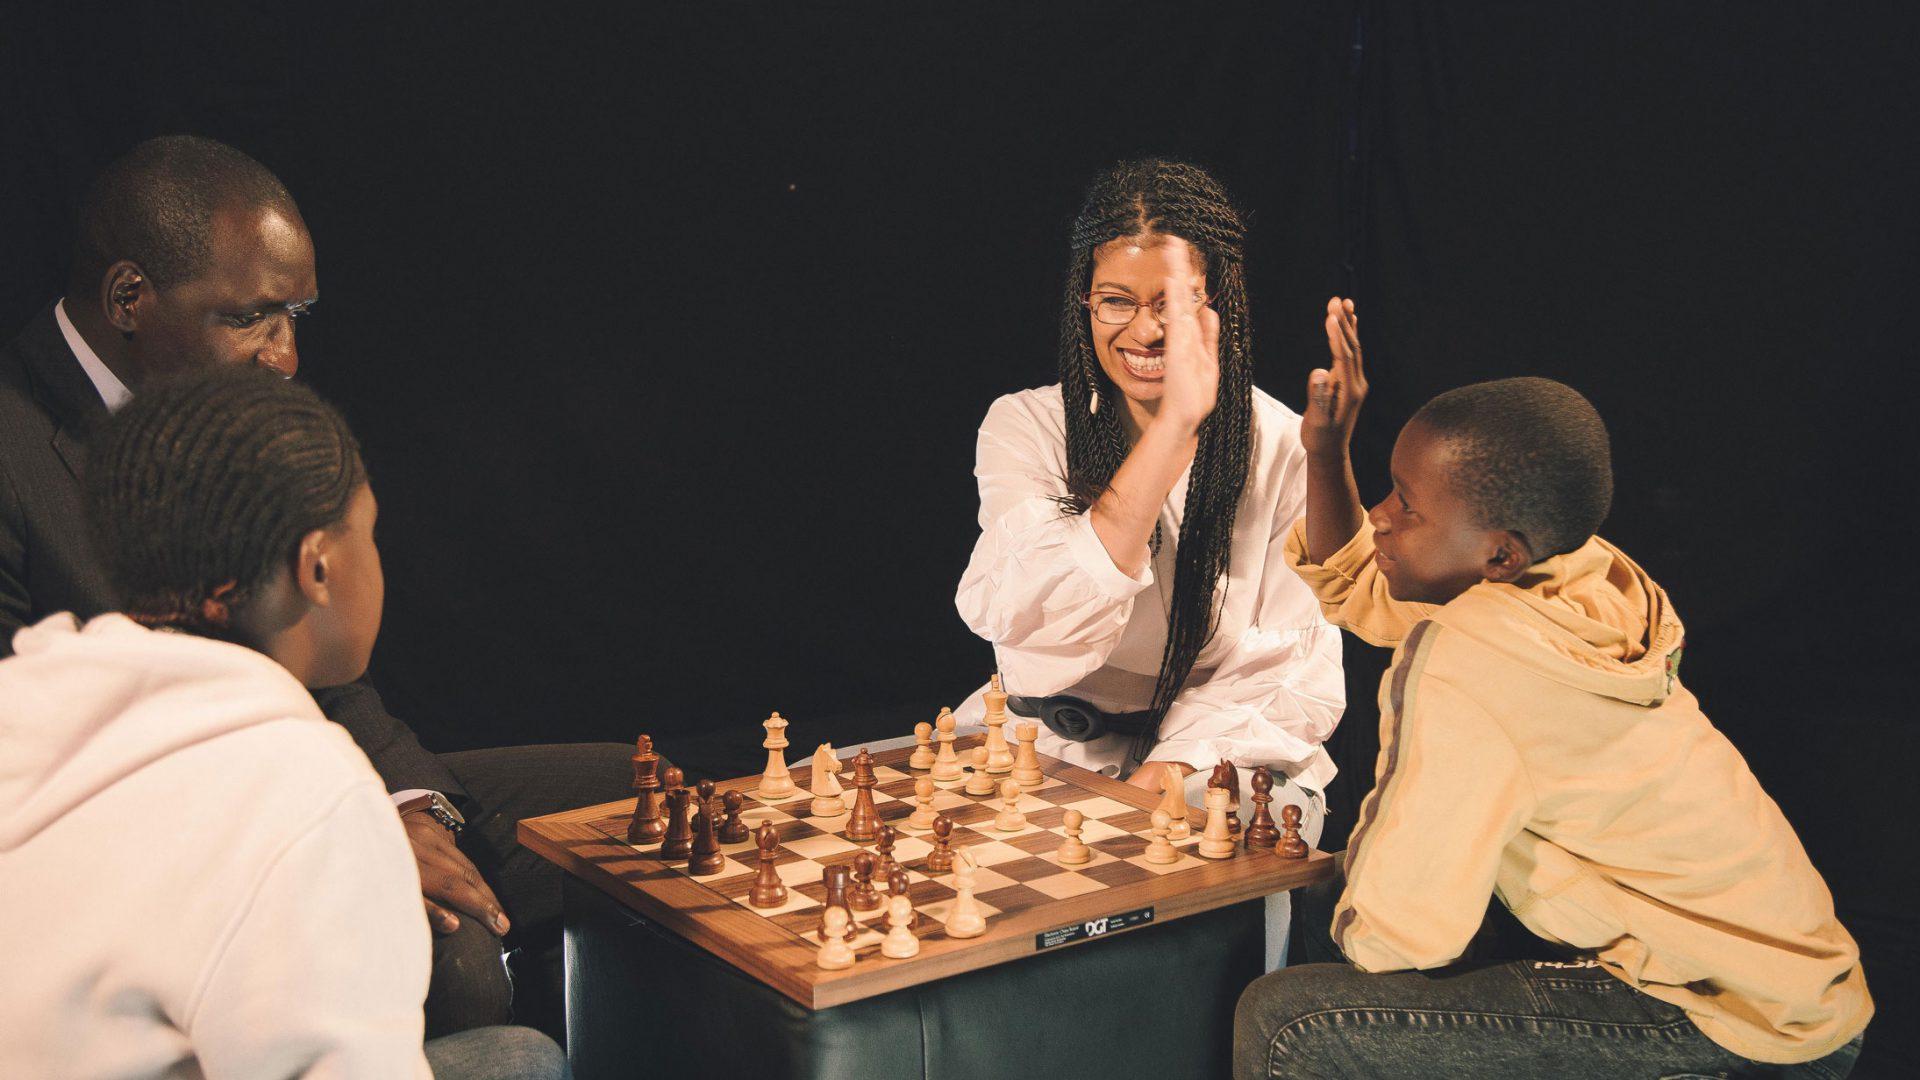 Business Meets Chess & Kids